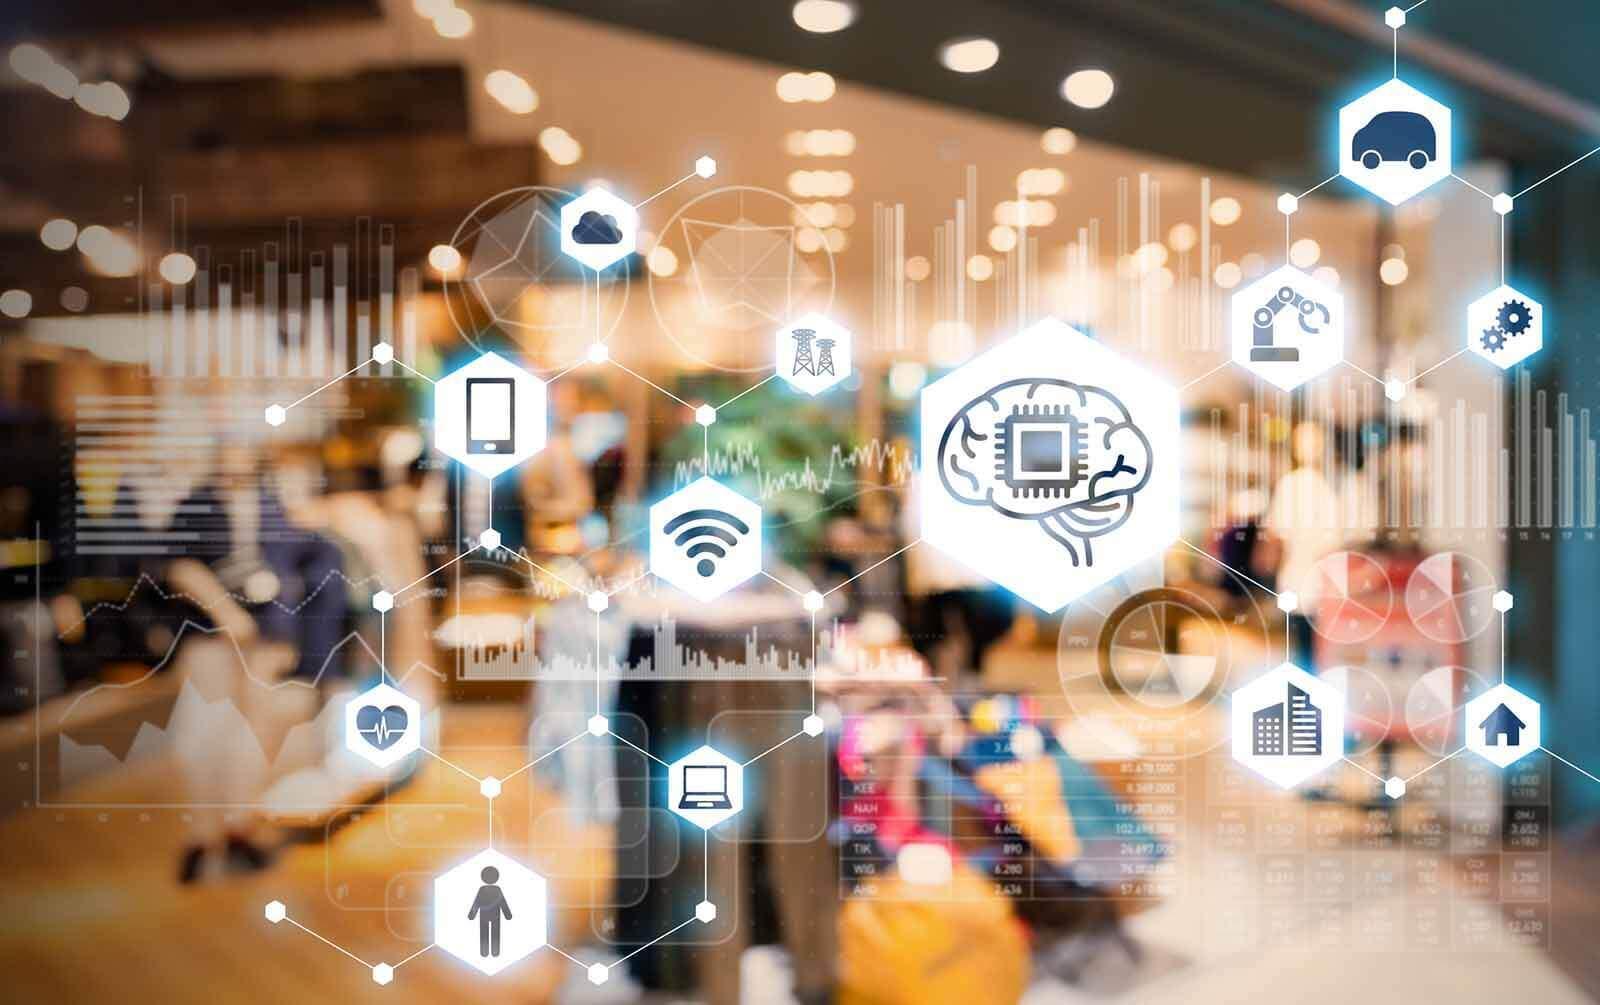 Digital Indoor Systems